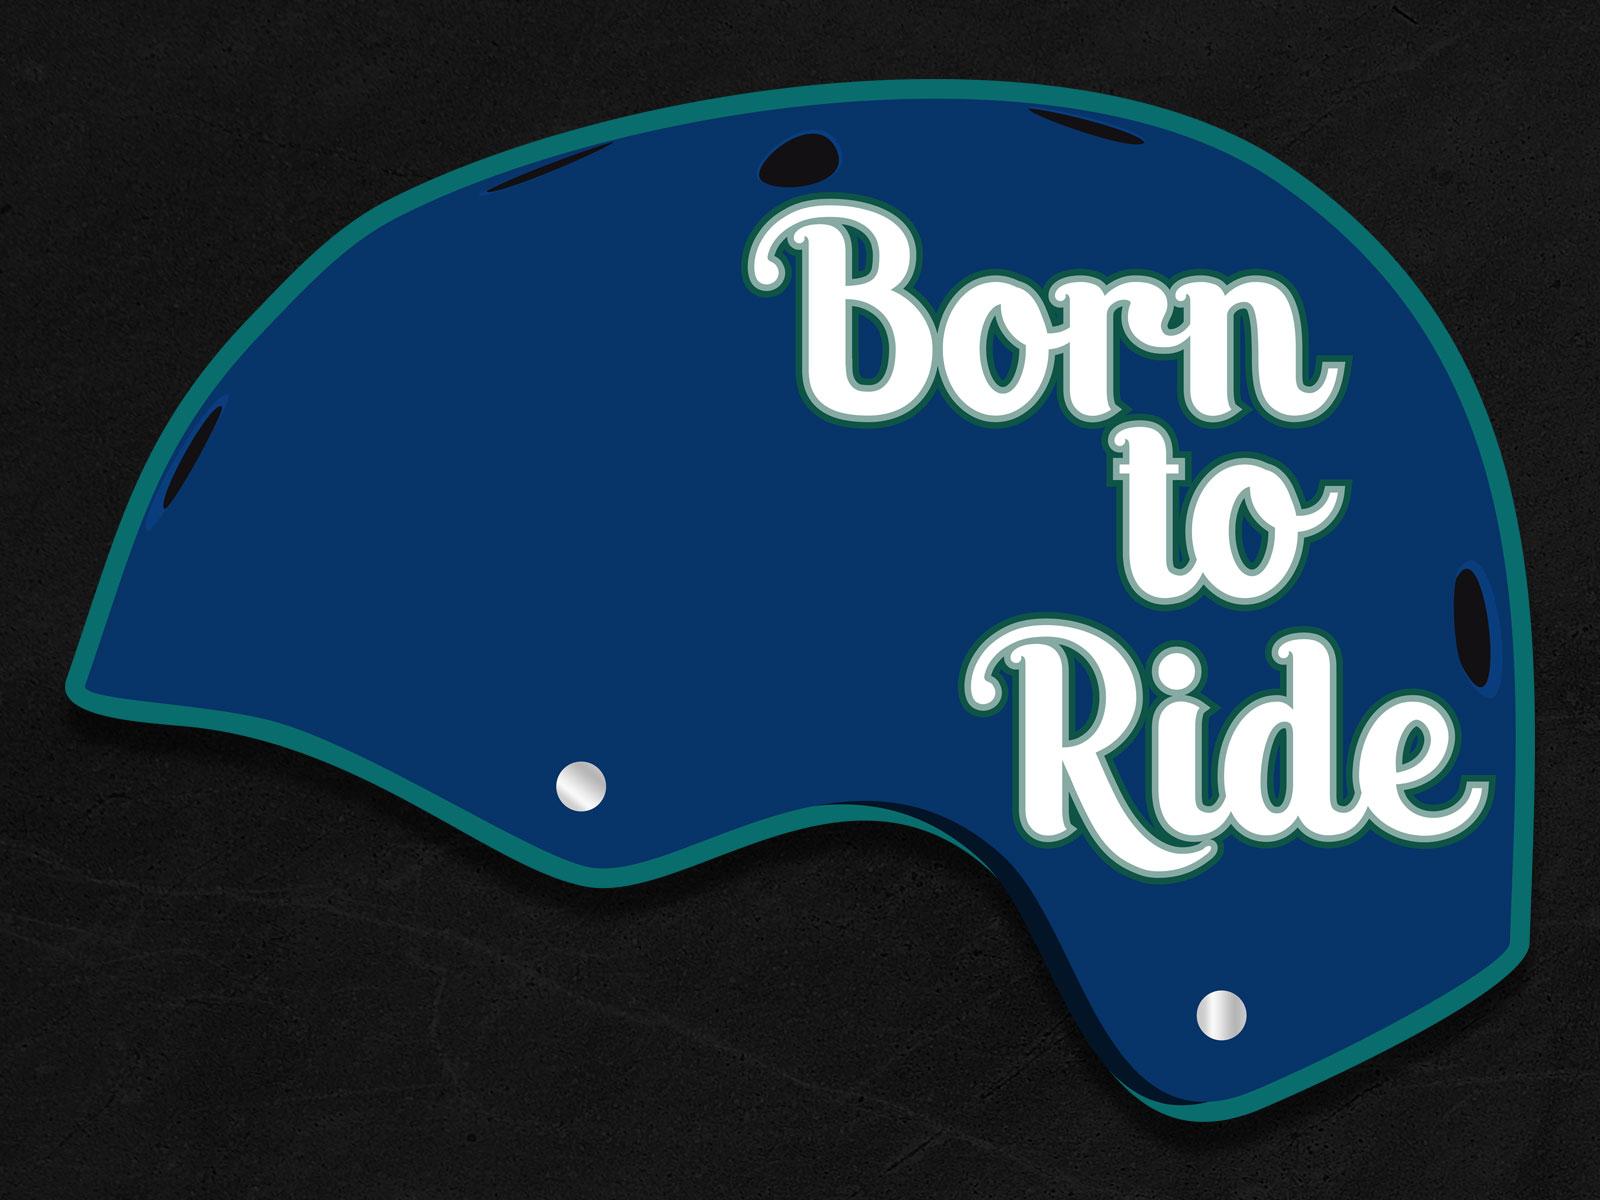 Skateboarding Born to ride landing image - Skateboarding – Born to ride Skateboarding Born to ride landing image - Portfolio – Print on demand